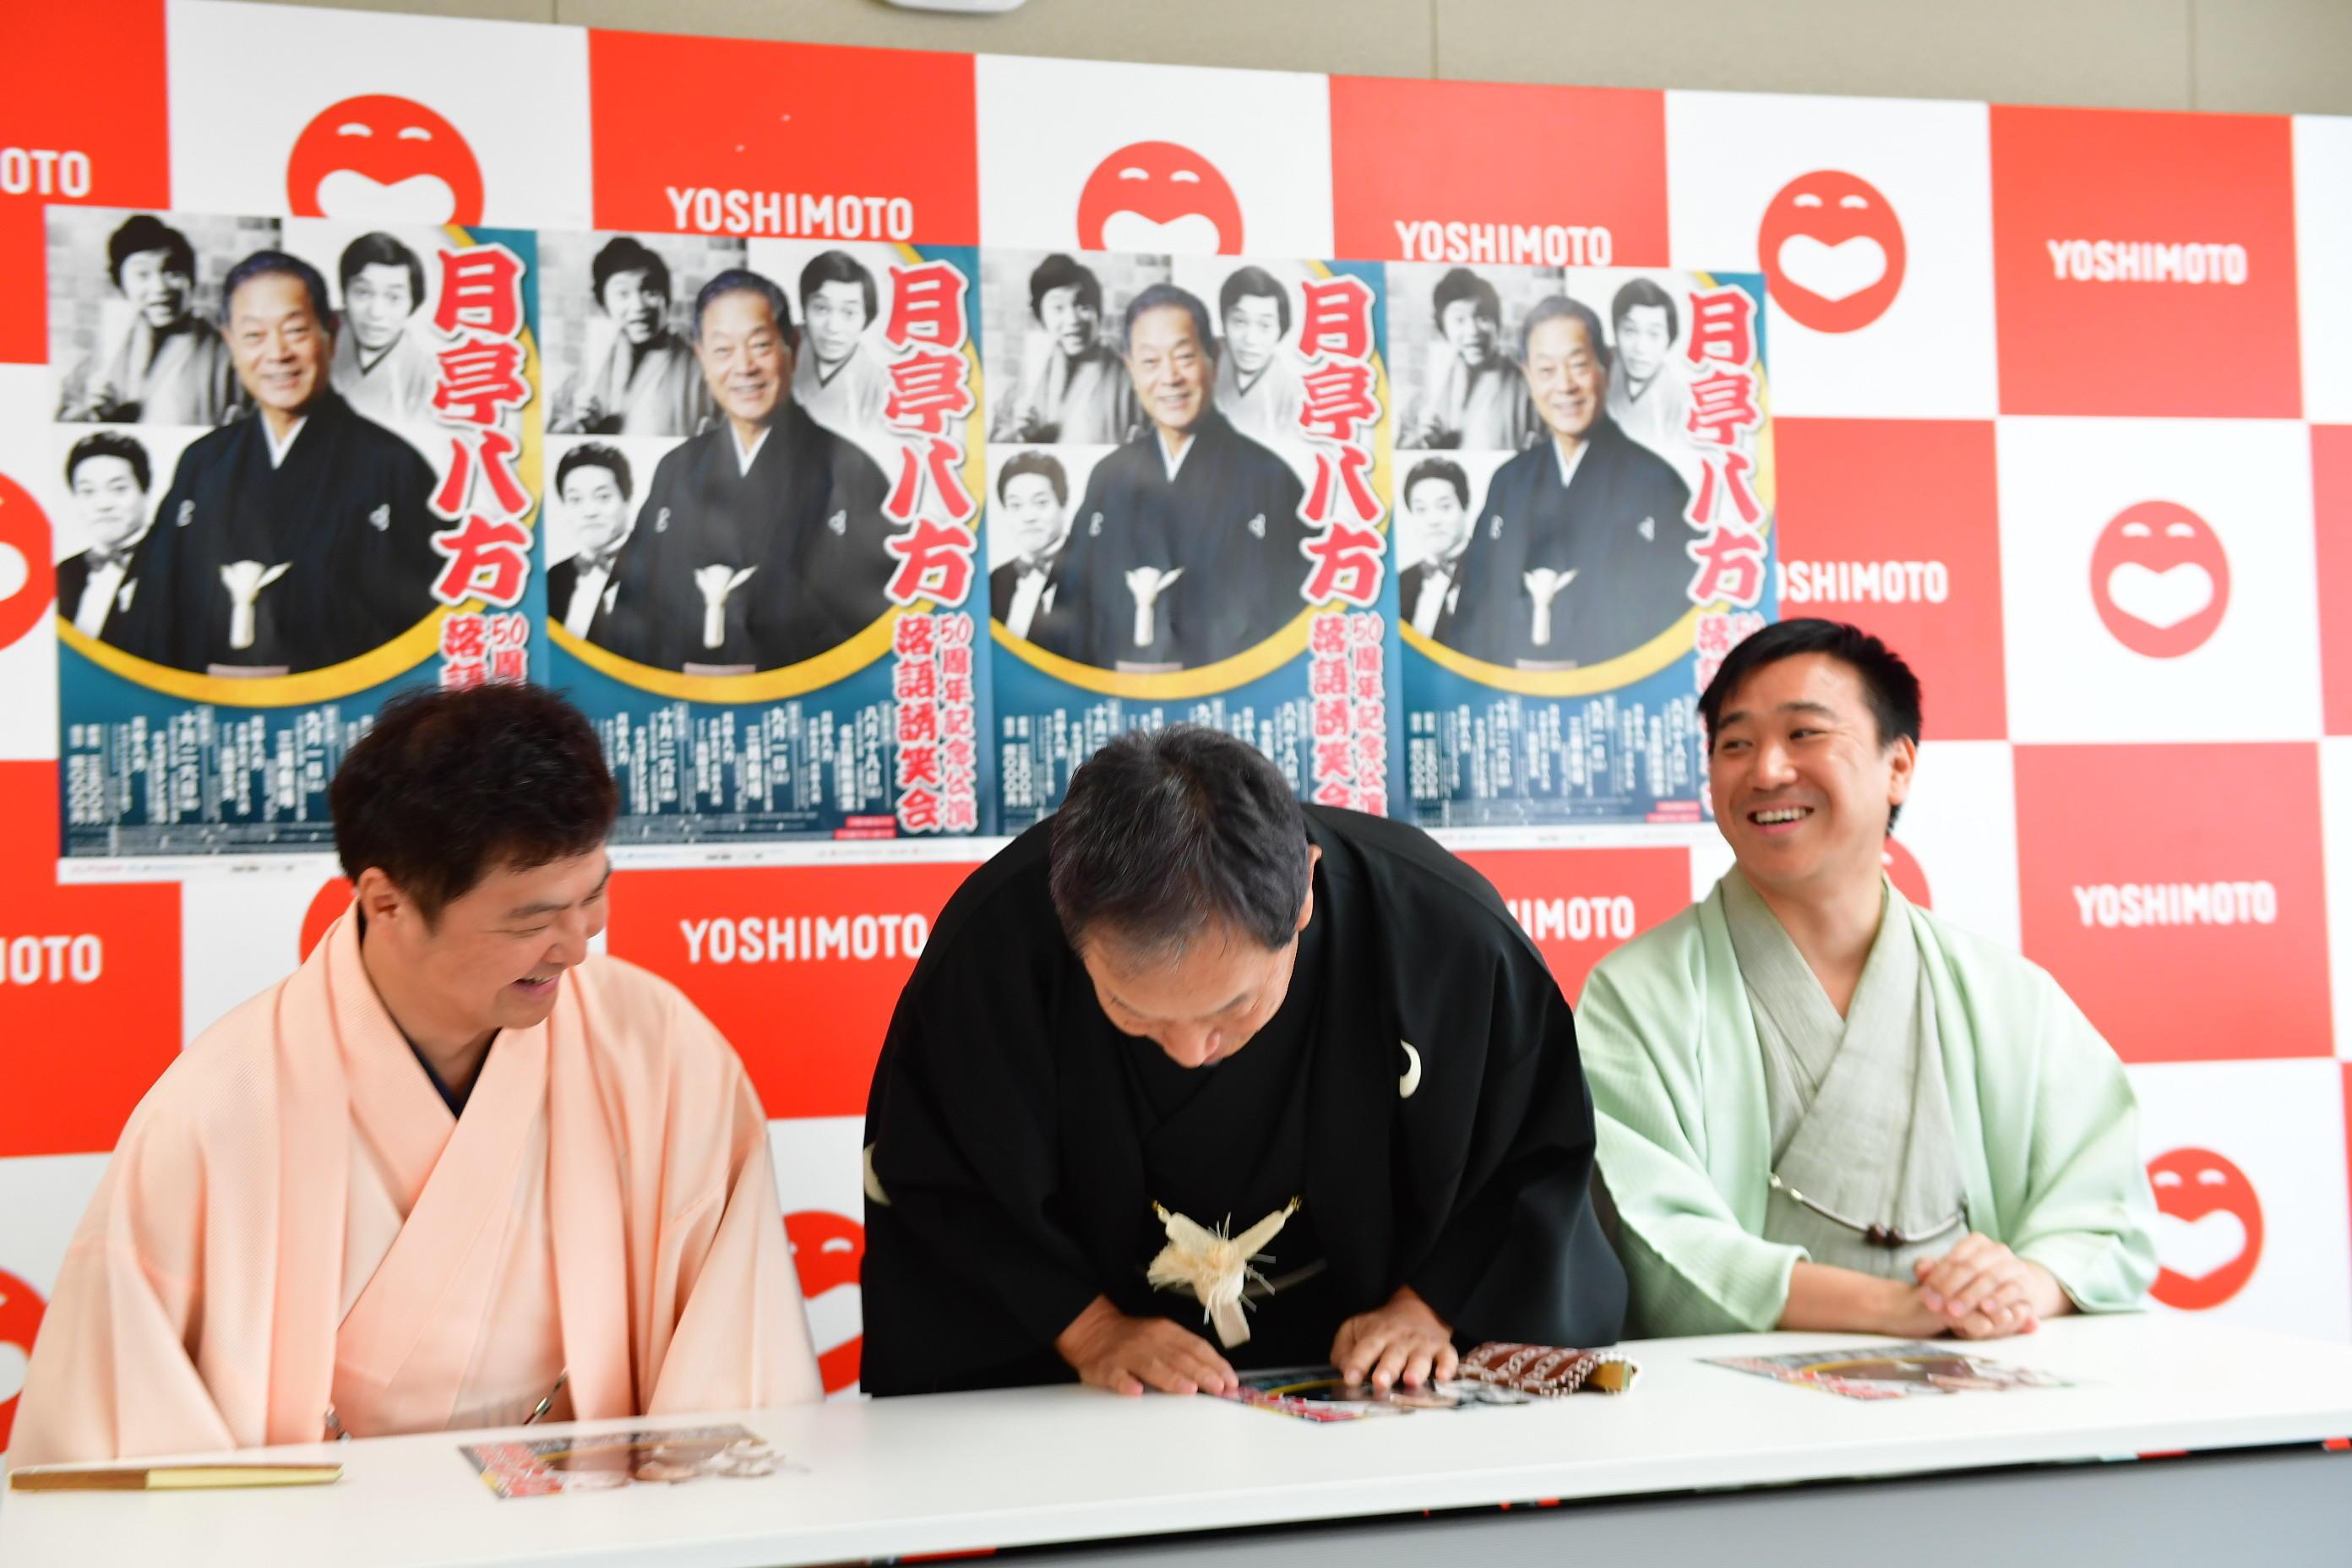 http://news.yoshimoto.co.jp/20180806204735-b0bd170ede4793dec7541e5bbac7cea858d10f41.jpg